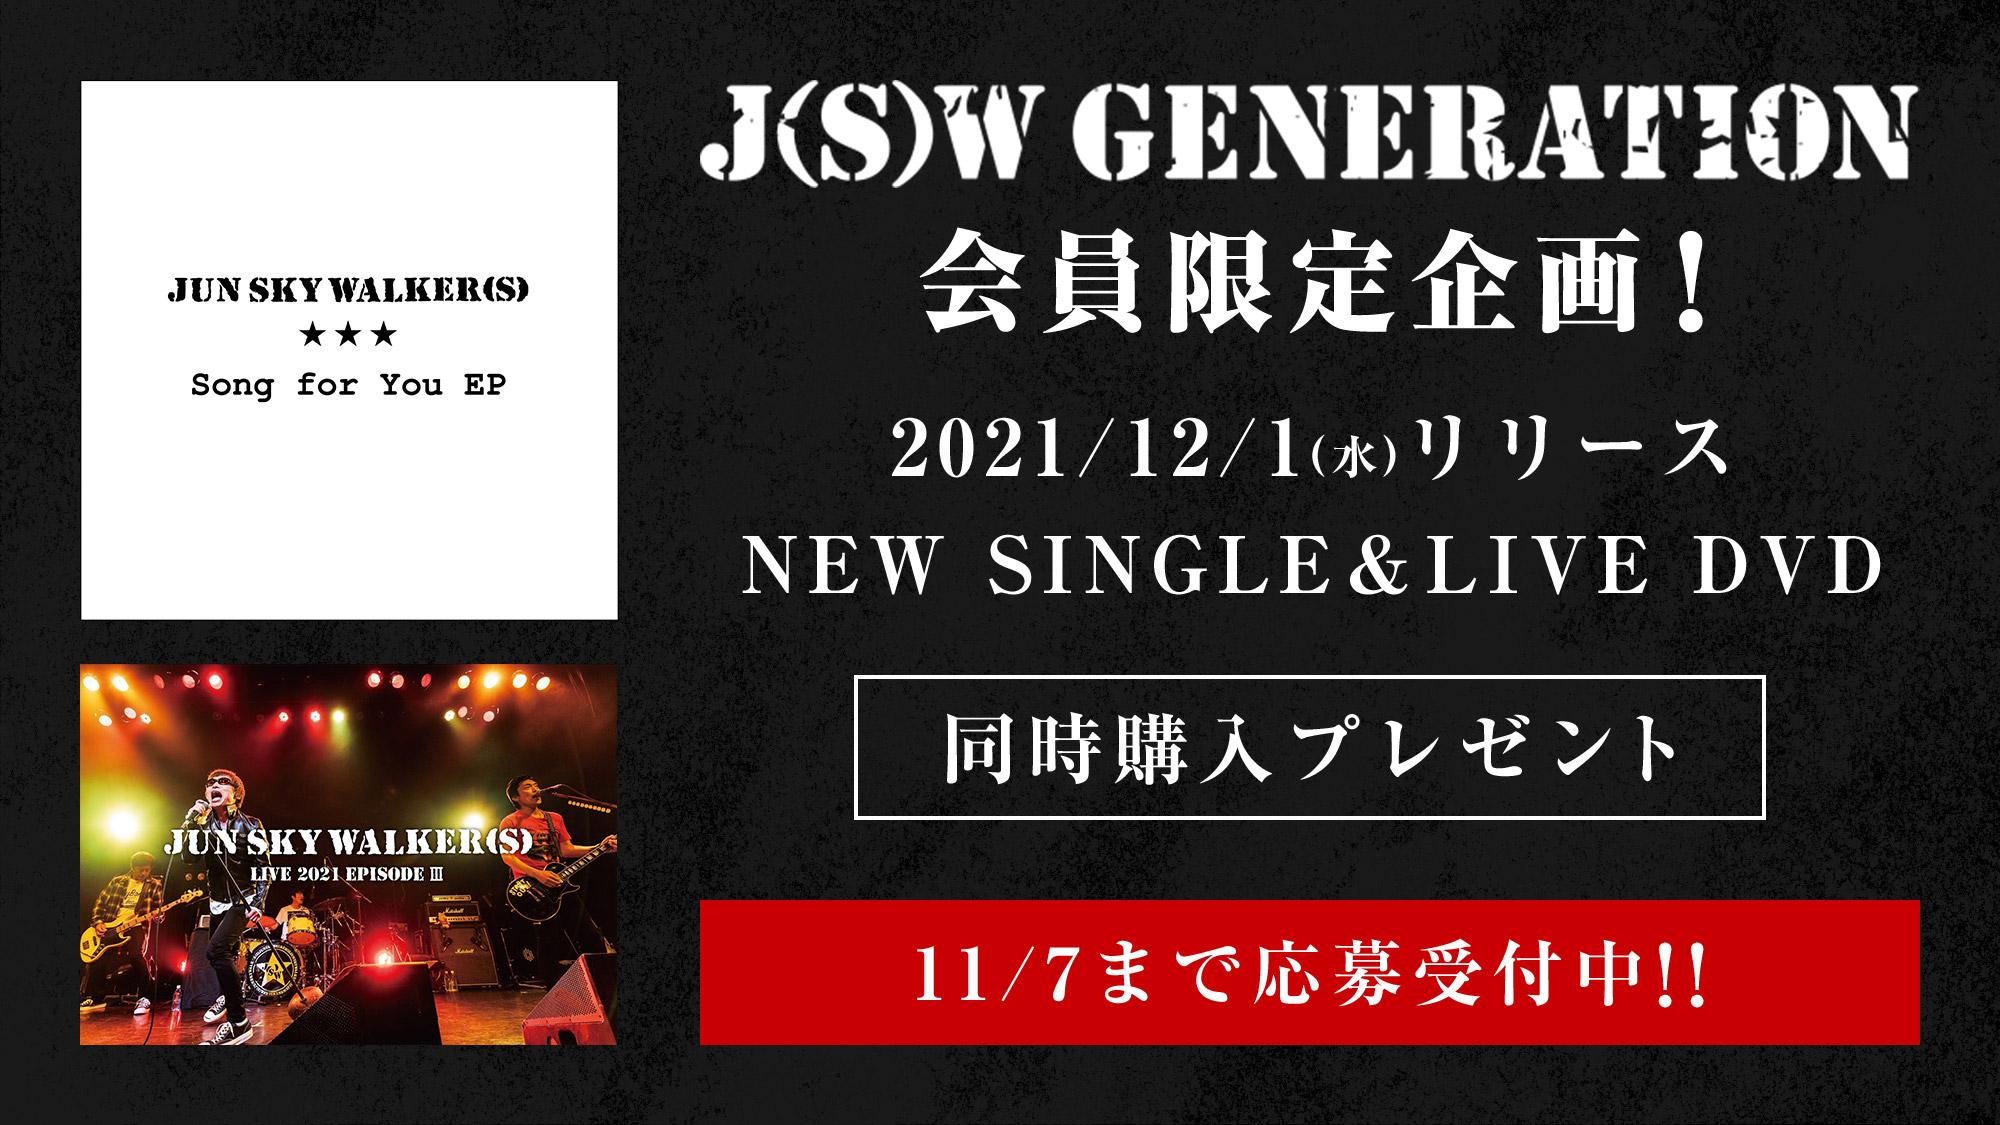 J(S)W GENERATION会員限定企画!